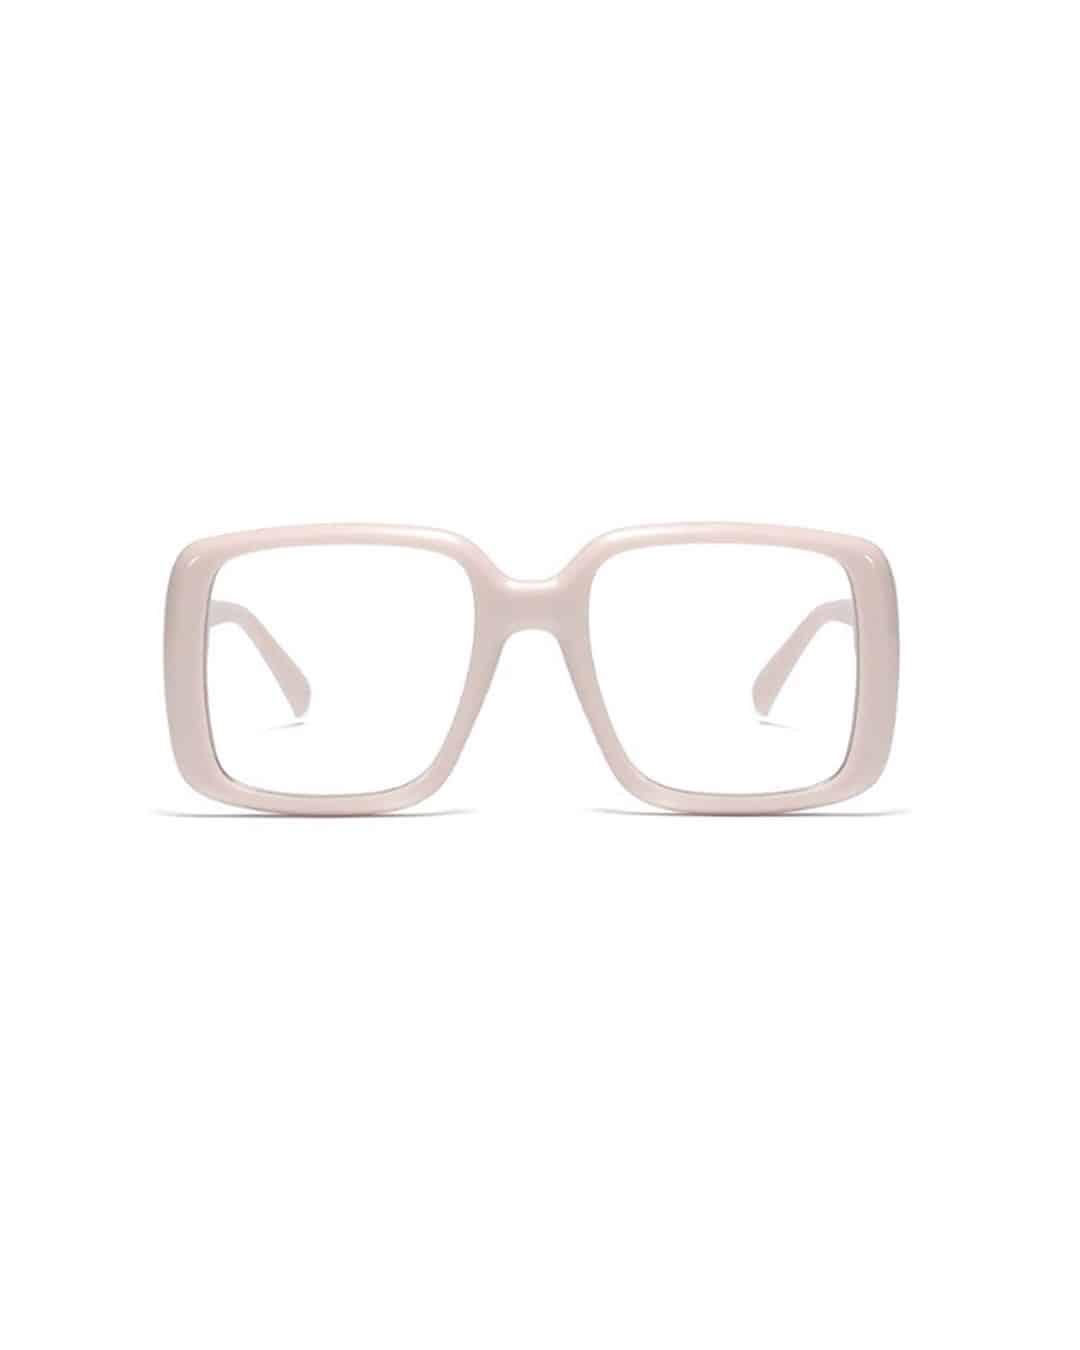 Chelsea-Opticals-White